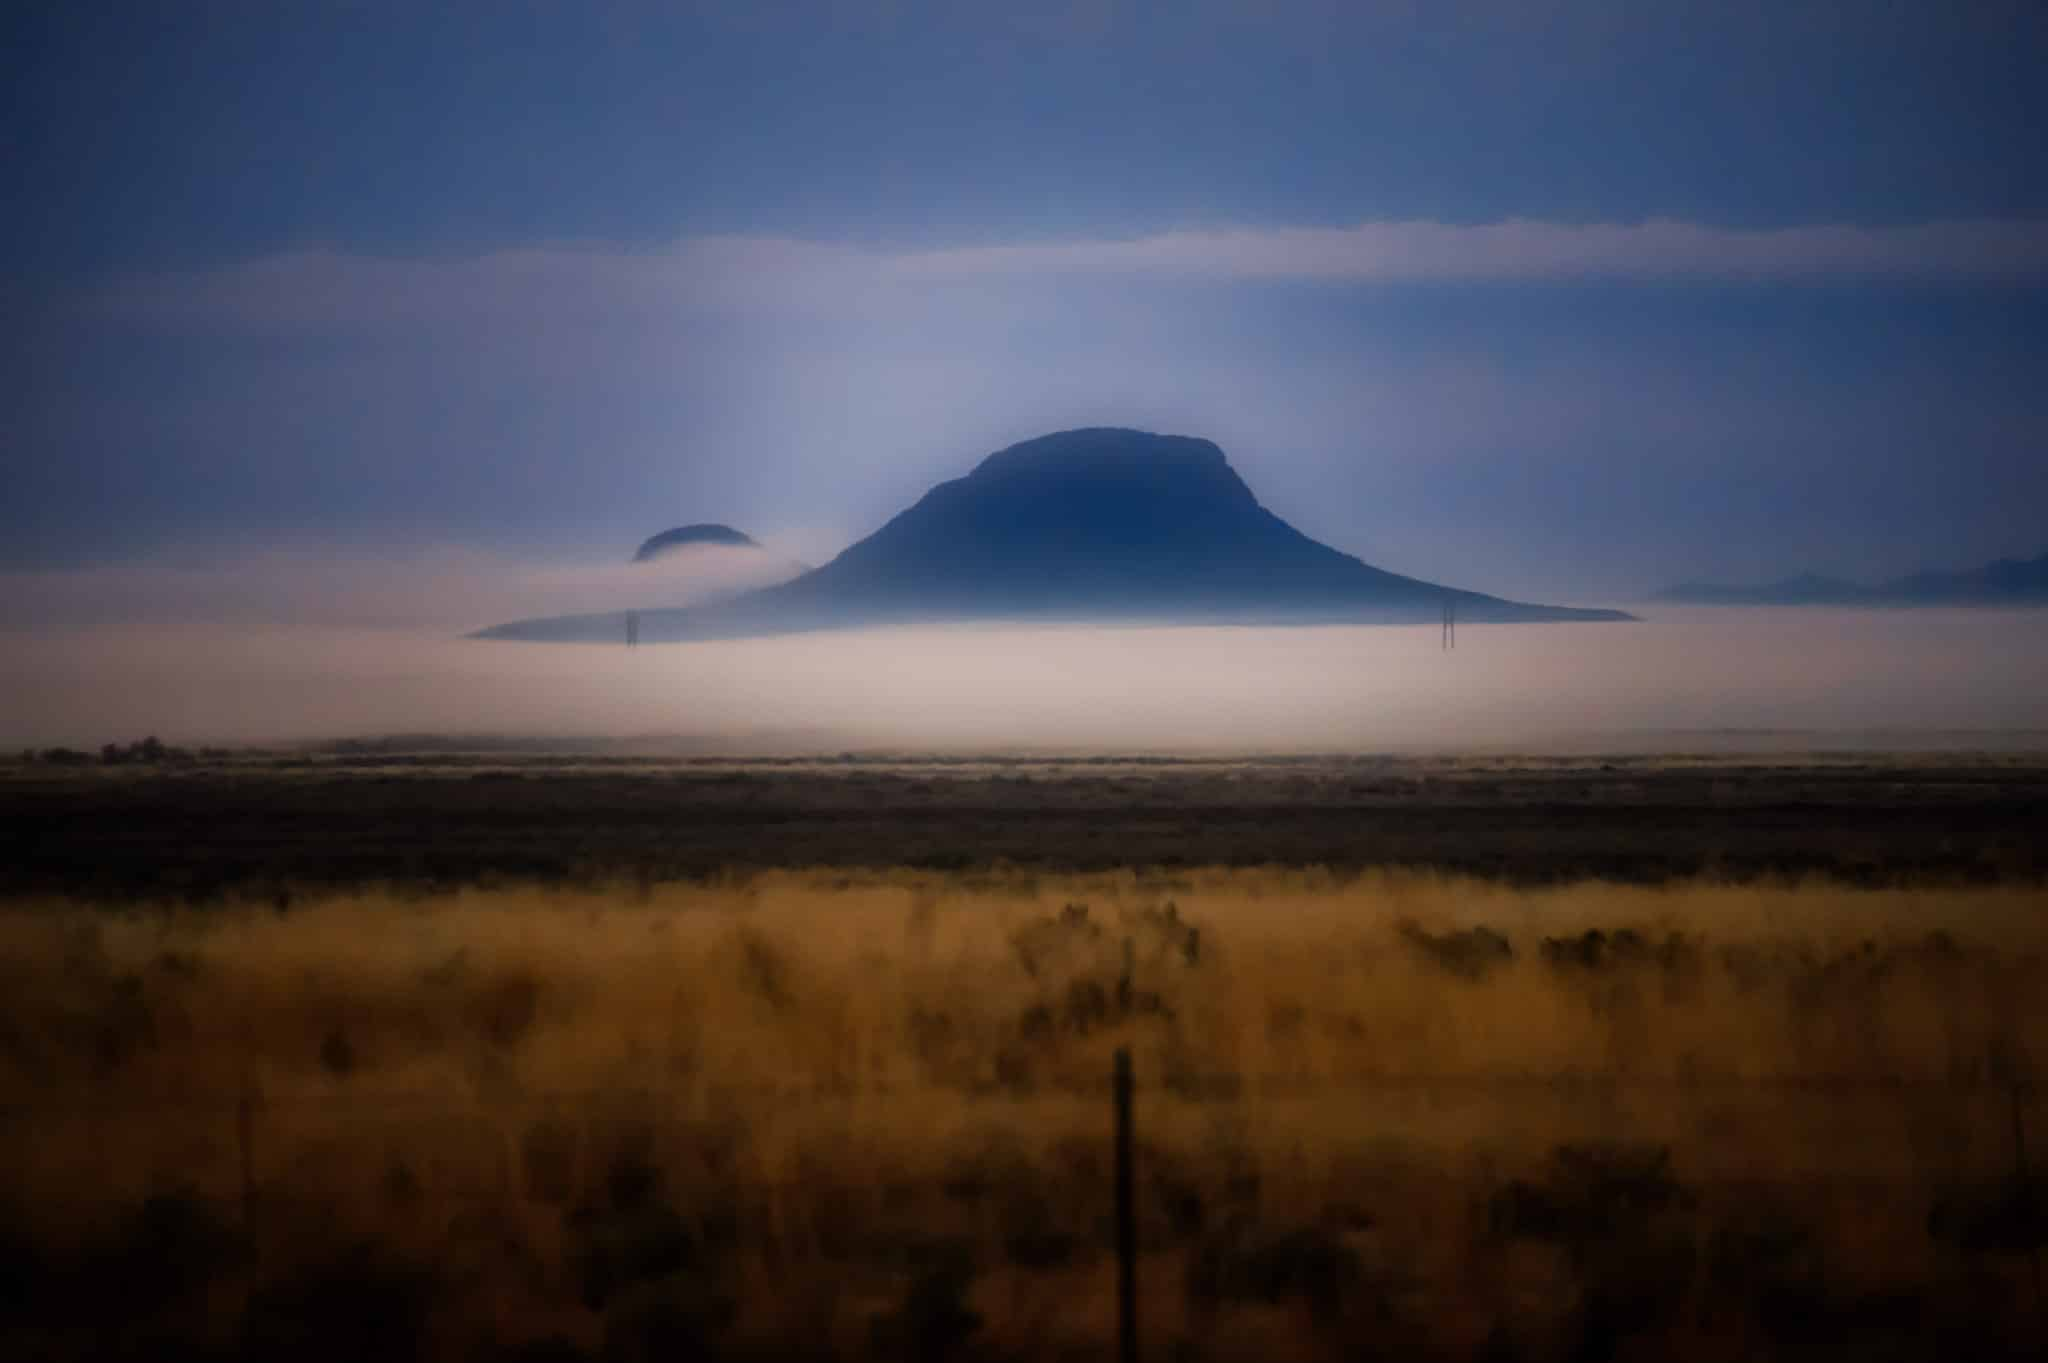 Morning fog shrouds the area around White Sand National Monument near Alamogordo, New Mexico.